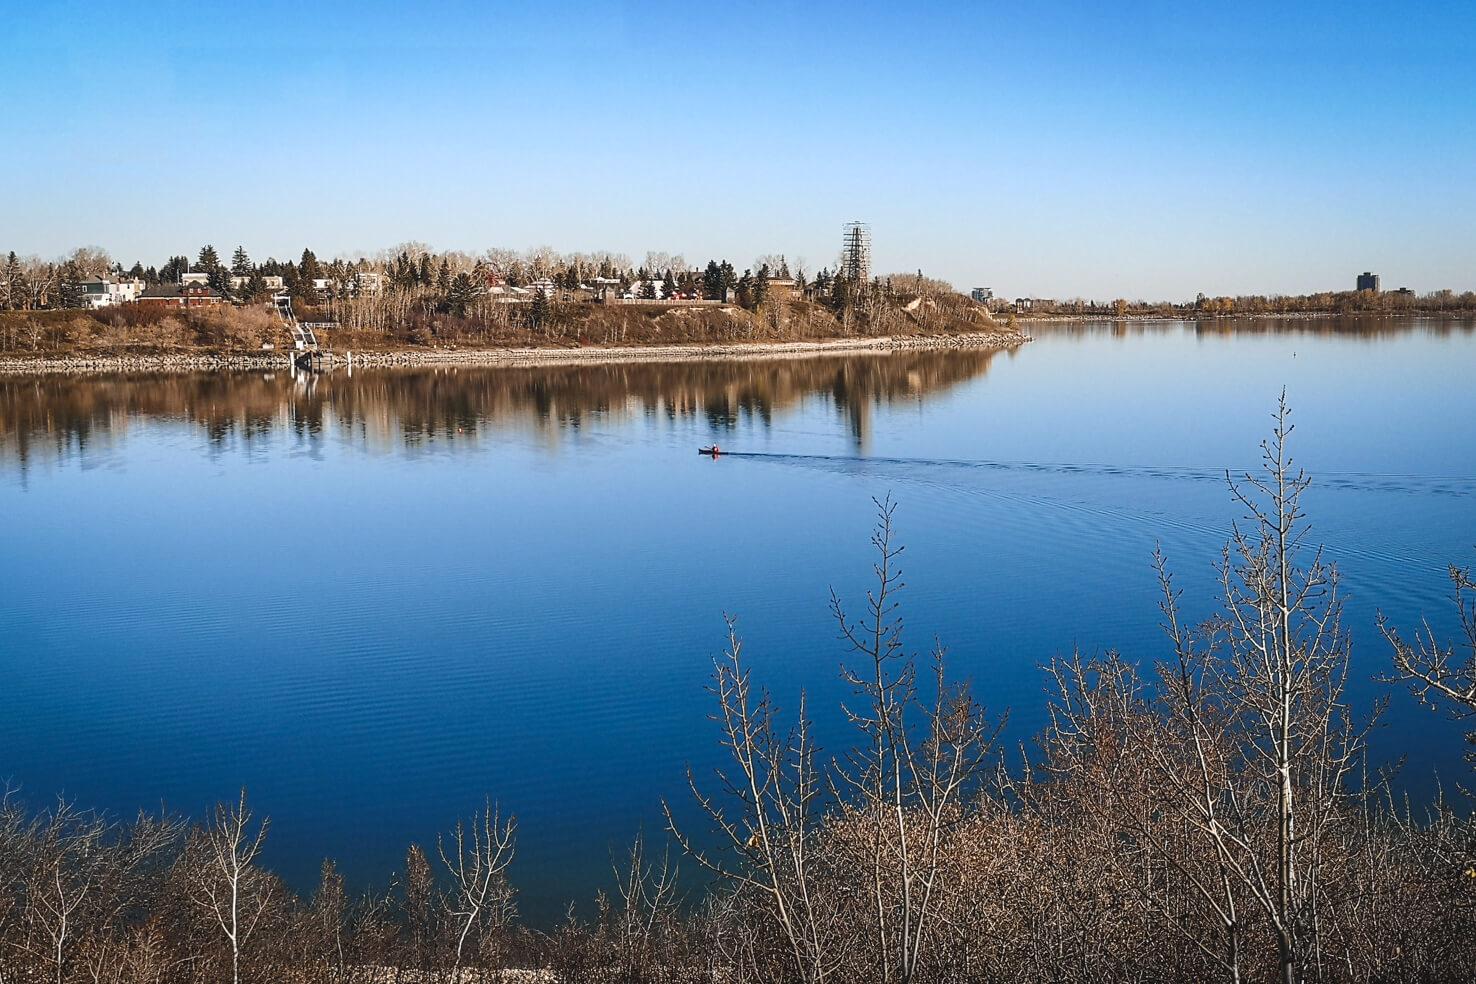 Things to do in Calgary in summer - Kayak on Glenmore reservoir